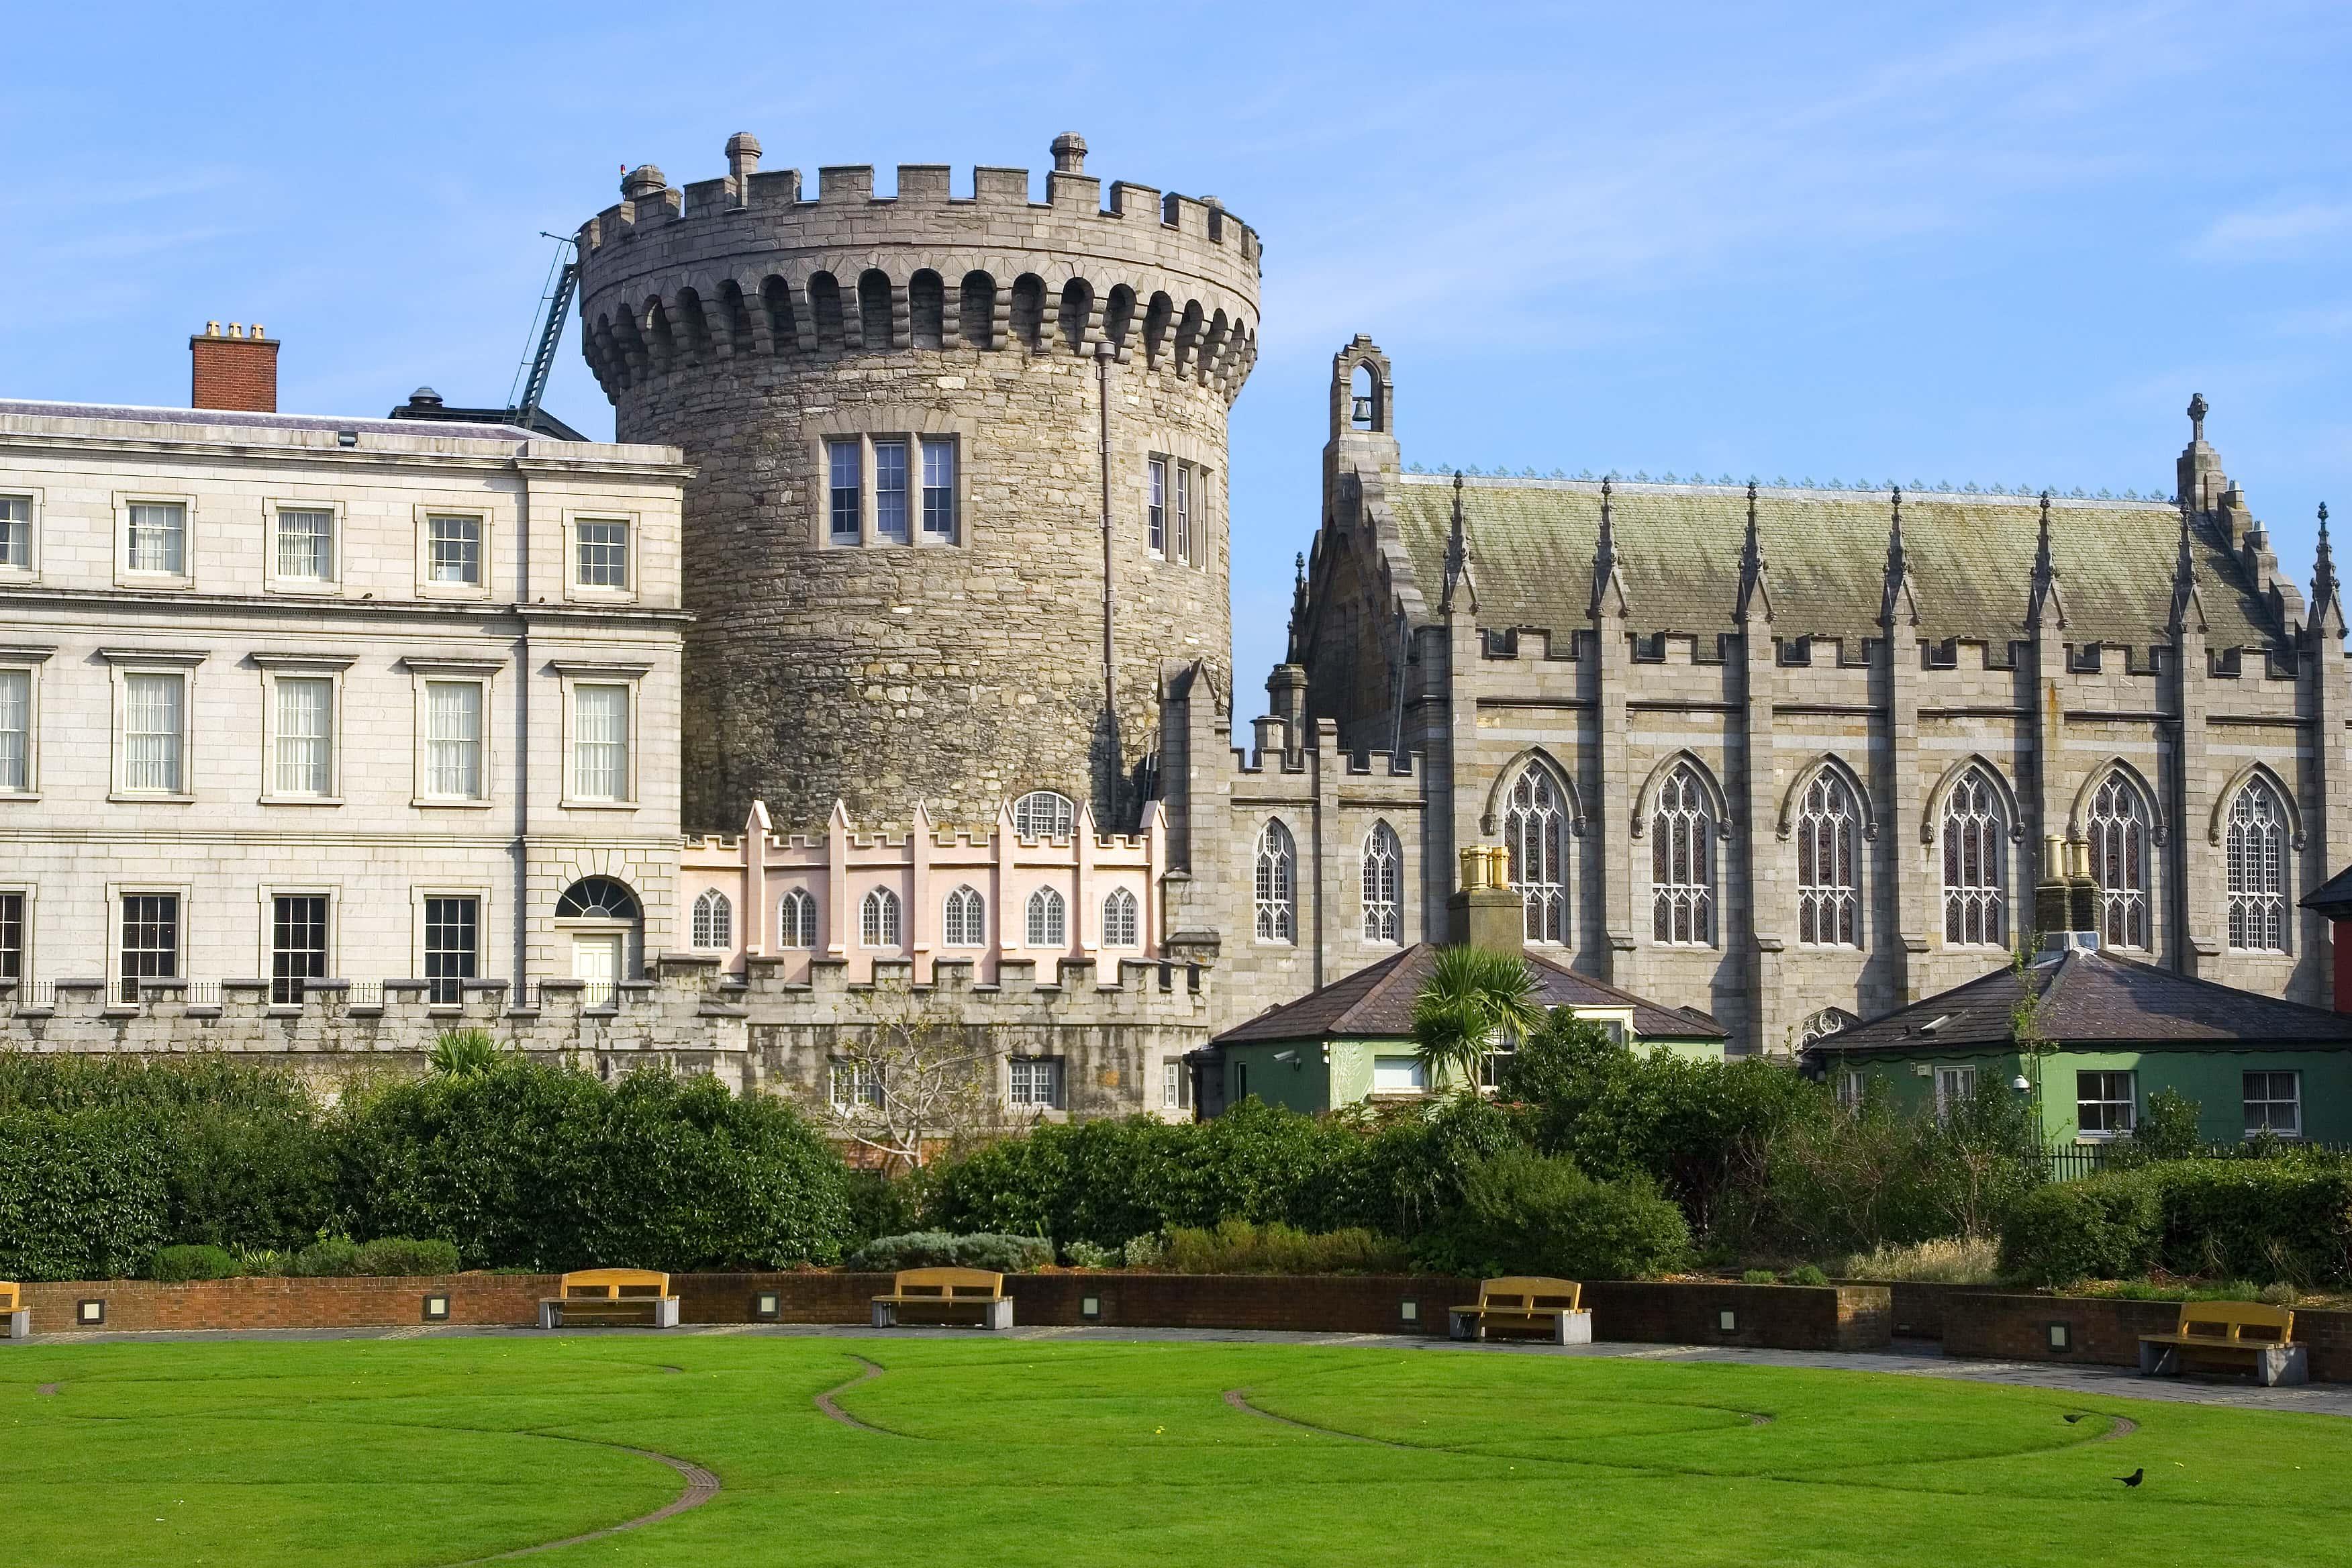 Dublin_Irelande_Dublin Castle_7400998-min